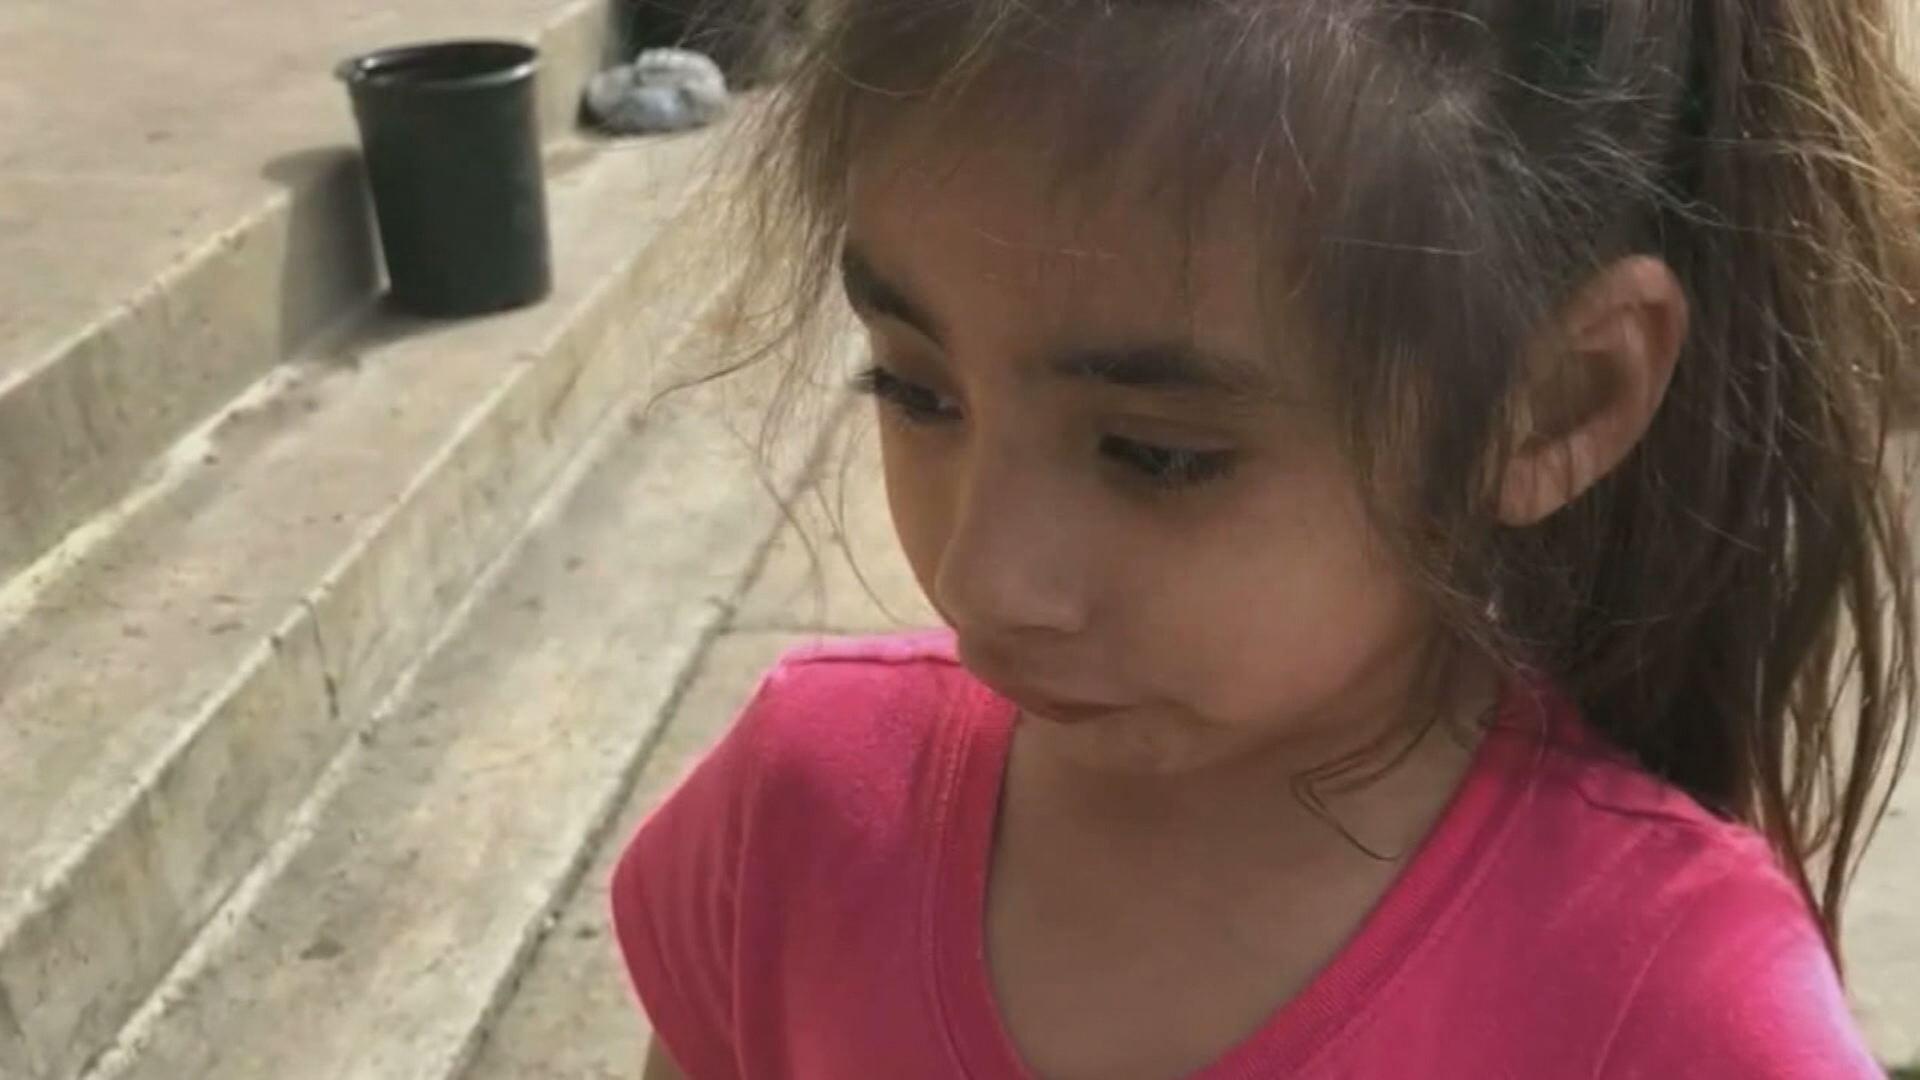 Missing Saudi child found dead inside water tank - News